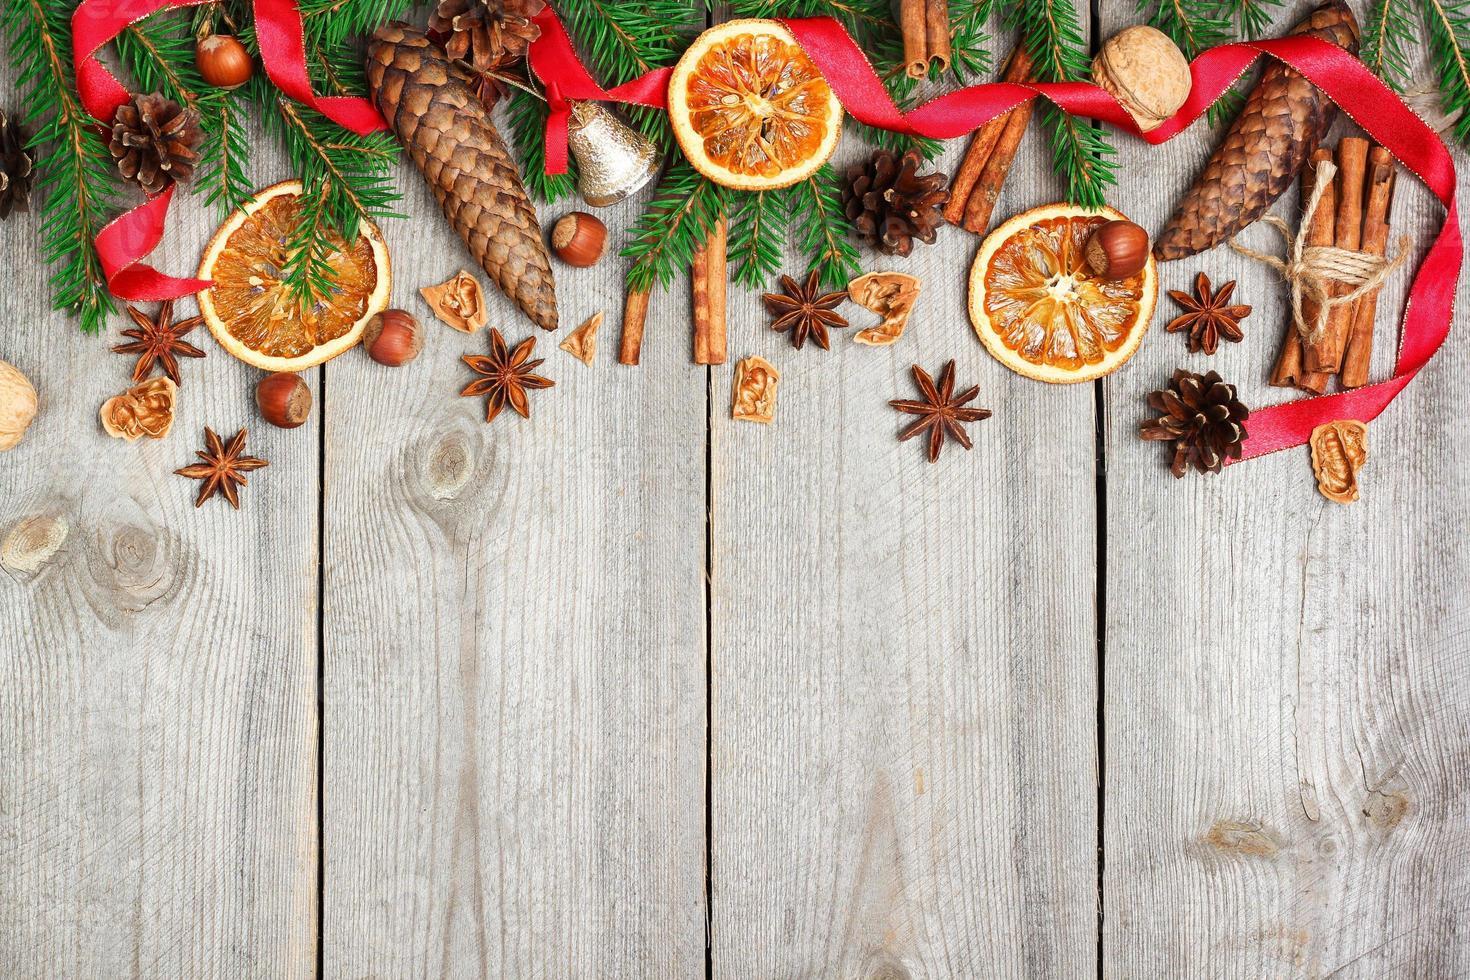 Kerstdecoratie met dennenboom, sinaasappels, kegels, kruiden foto